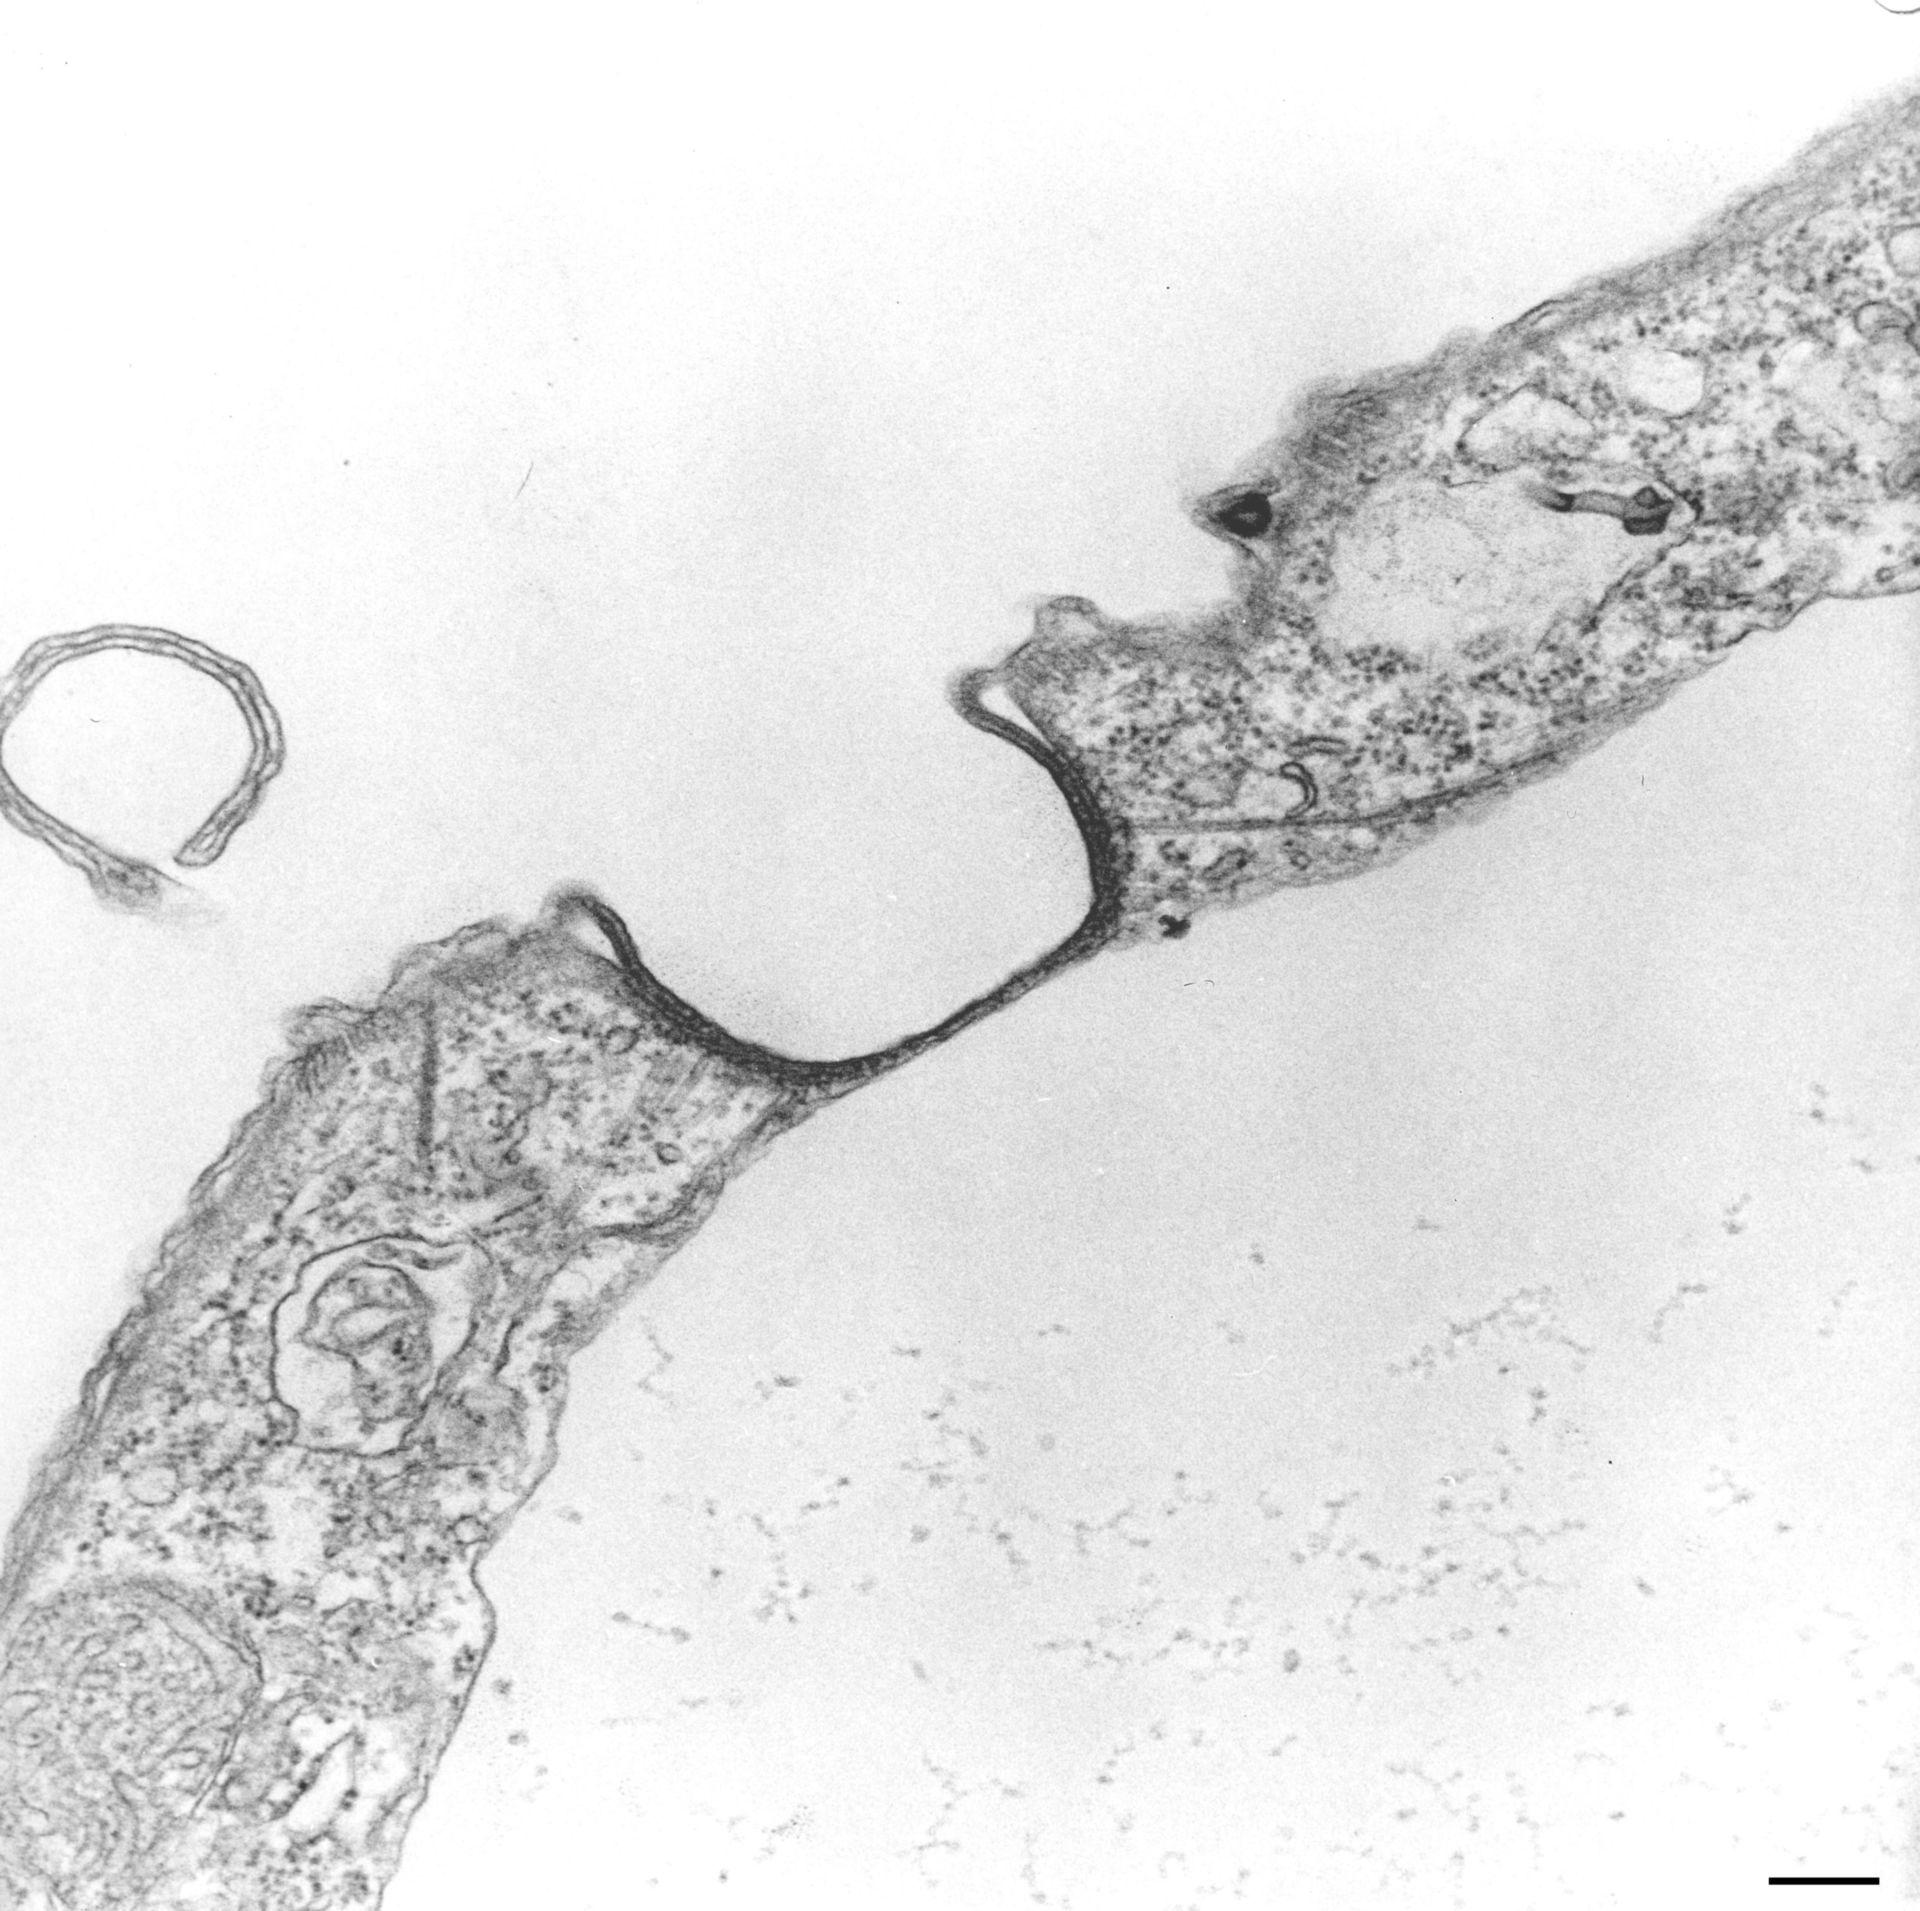 Tetrahymena pyriformis (complesso associato ai microtubuli) - CIL:130